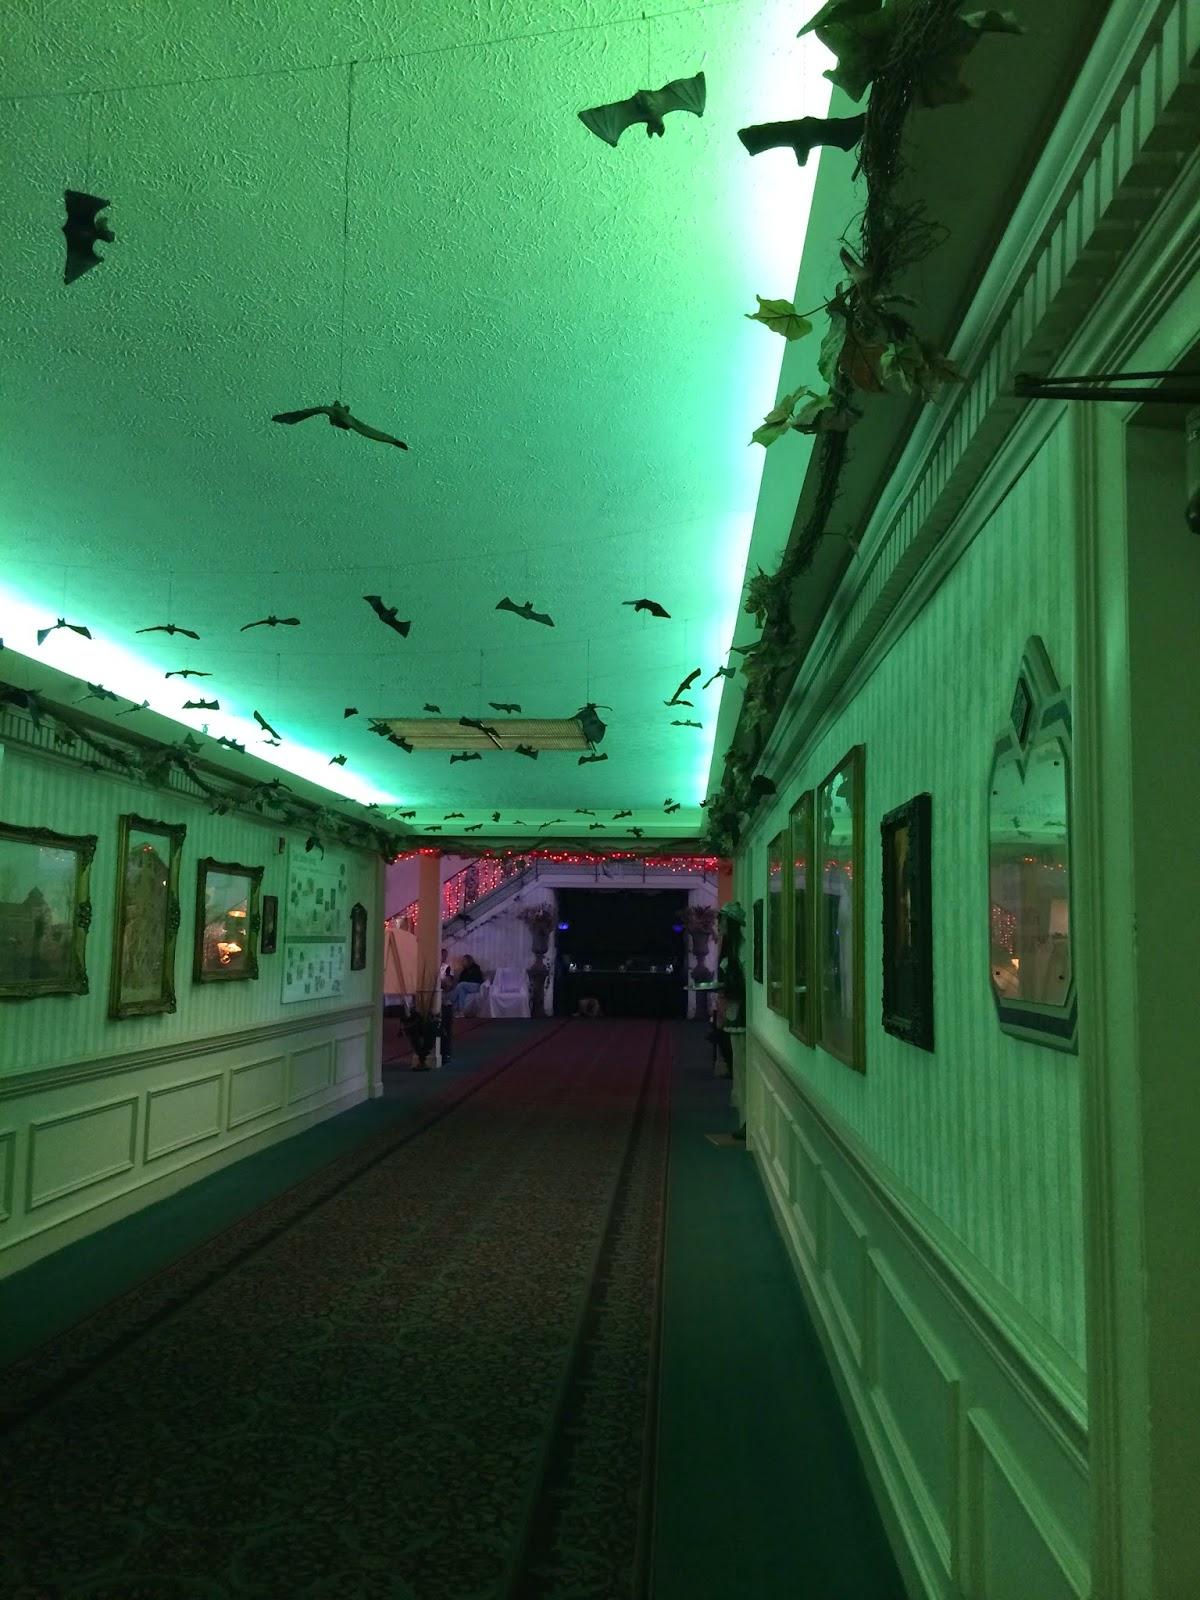 Hotel Breakers at Cedar Point's Bat Hallway for Halloweekends